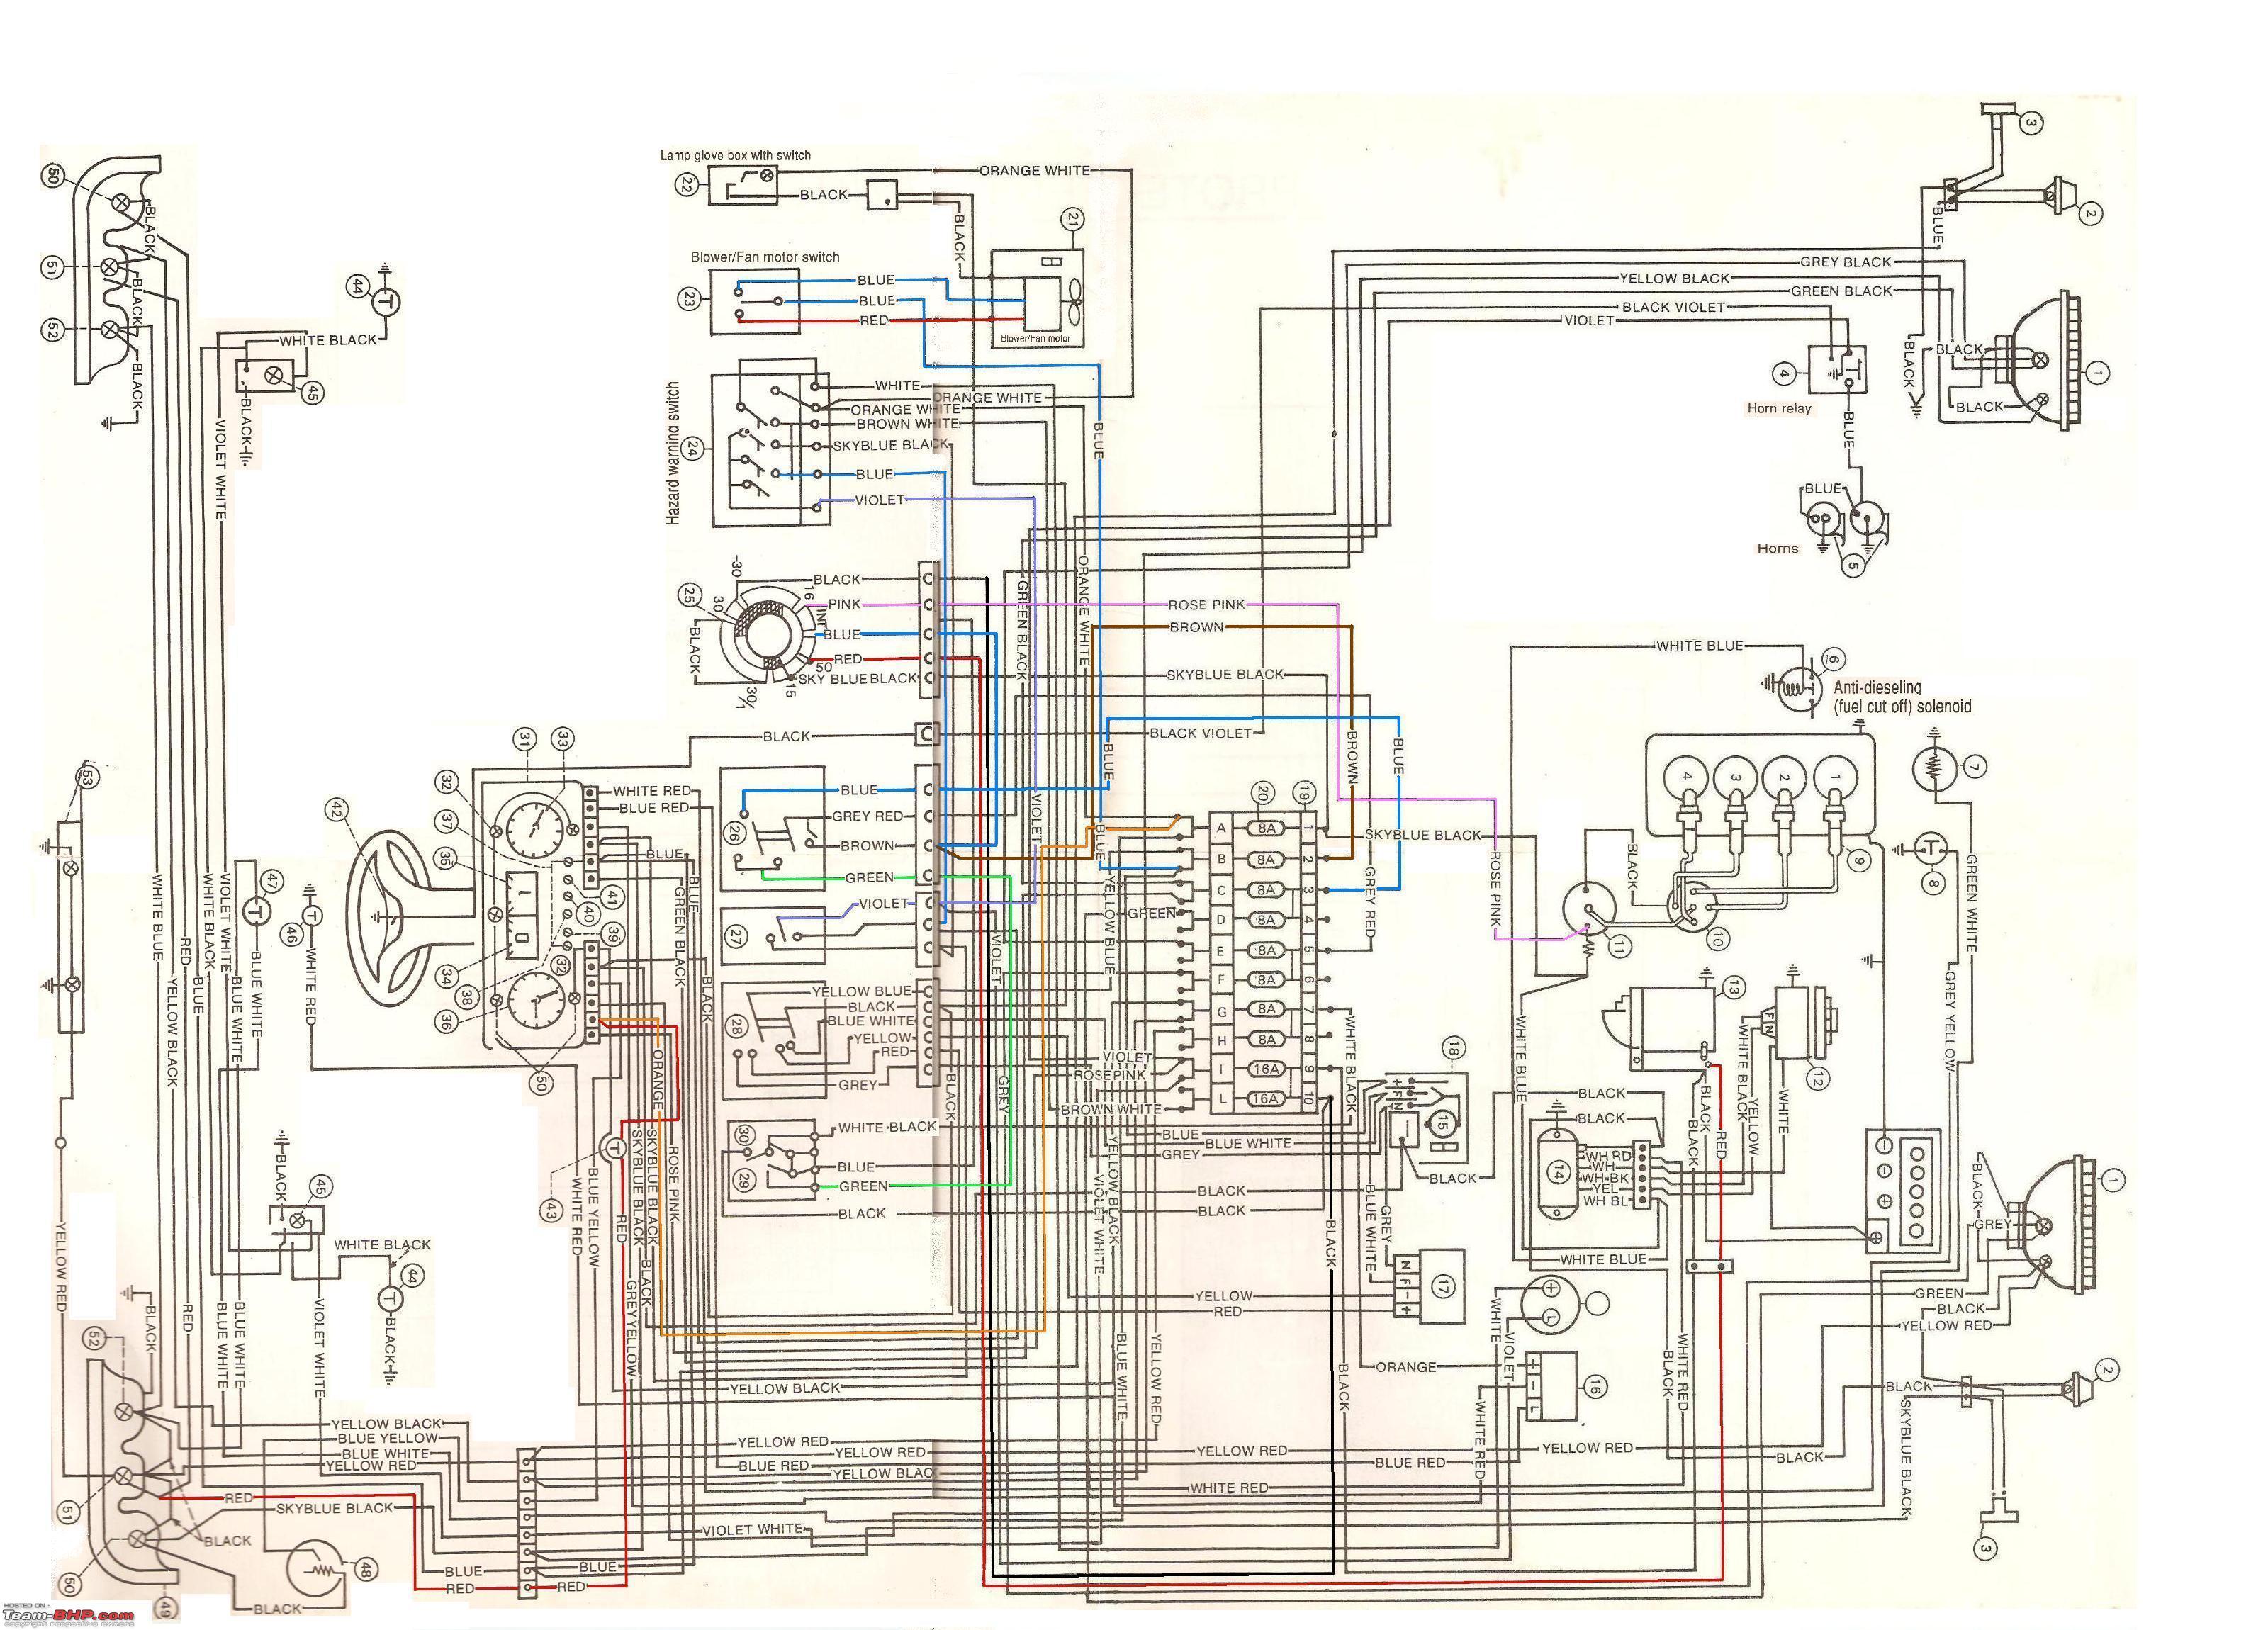 maruti suzuki wiring diagram 13 1 pluspatrunoua de \u2022maruti car manuals wiring diagrams pdf fault codes rh automotive manuals net maruti suzuki ritz wiring